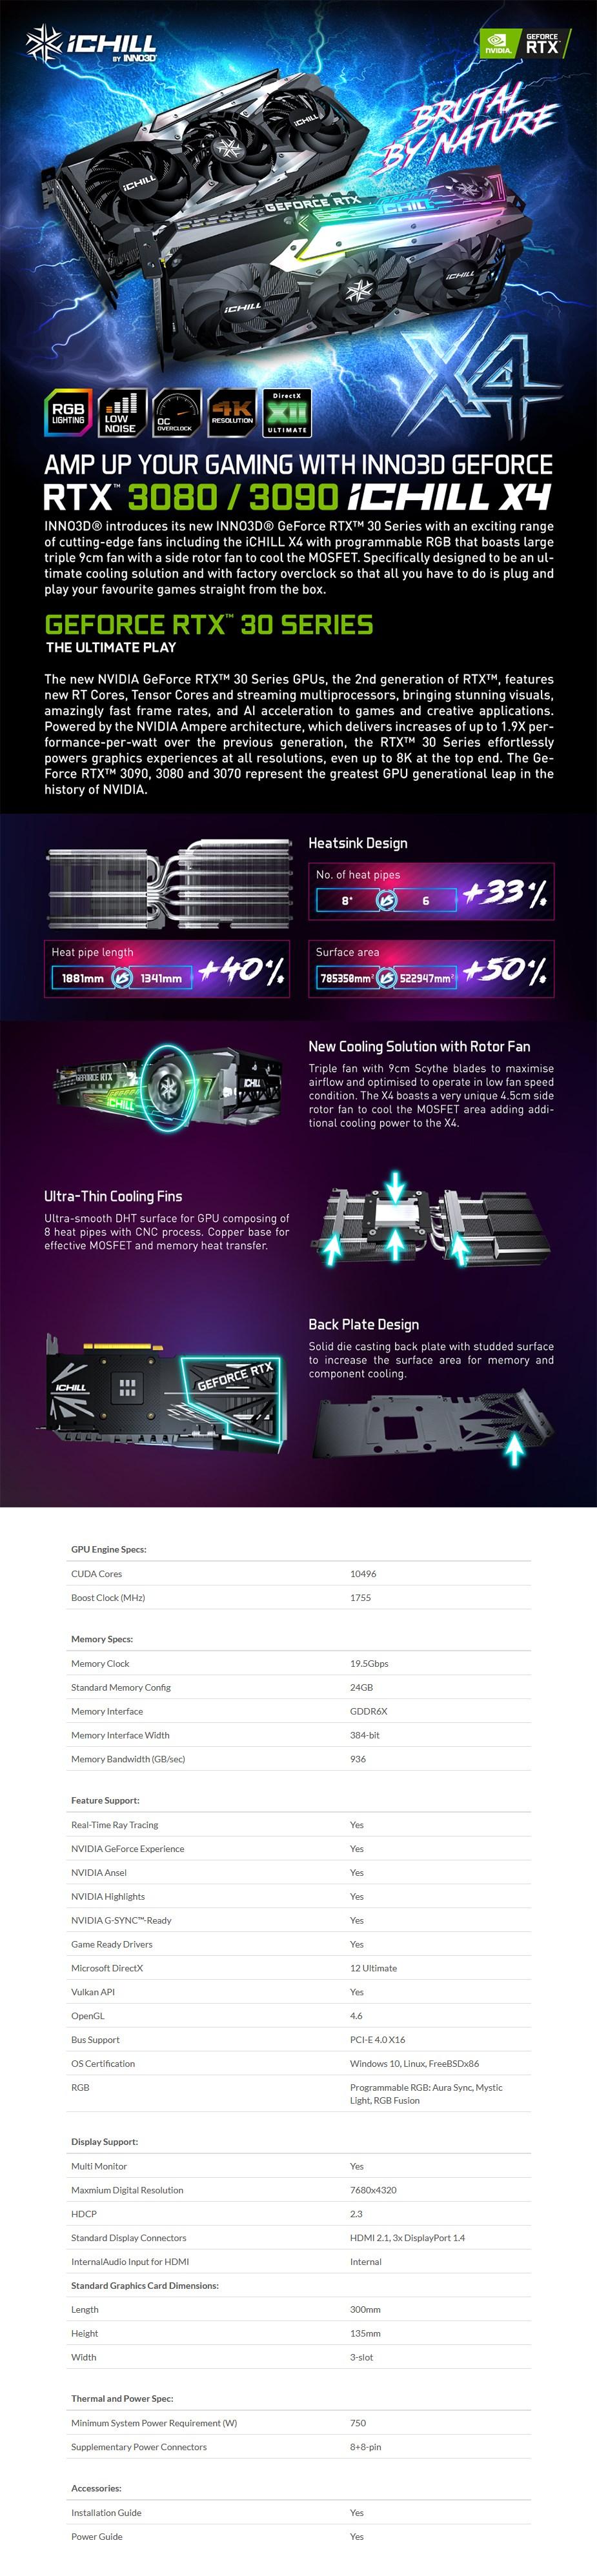 Inno3D GeForce RTX 3090 iChill X4 24GB Video Card - Overview 1